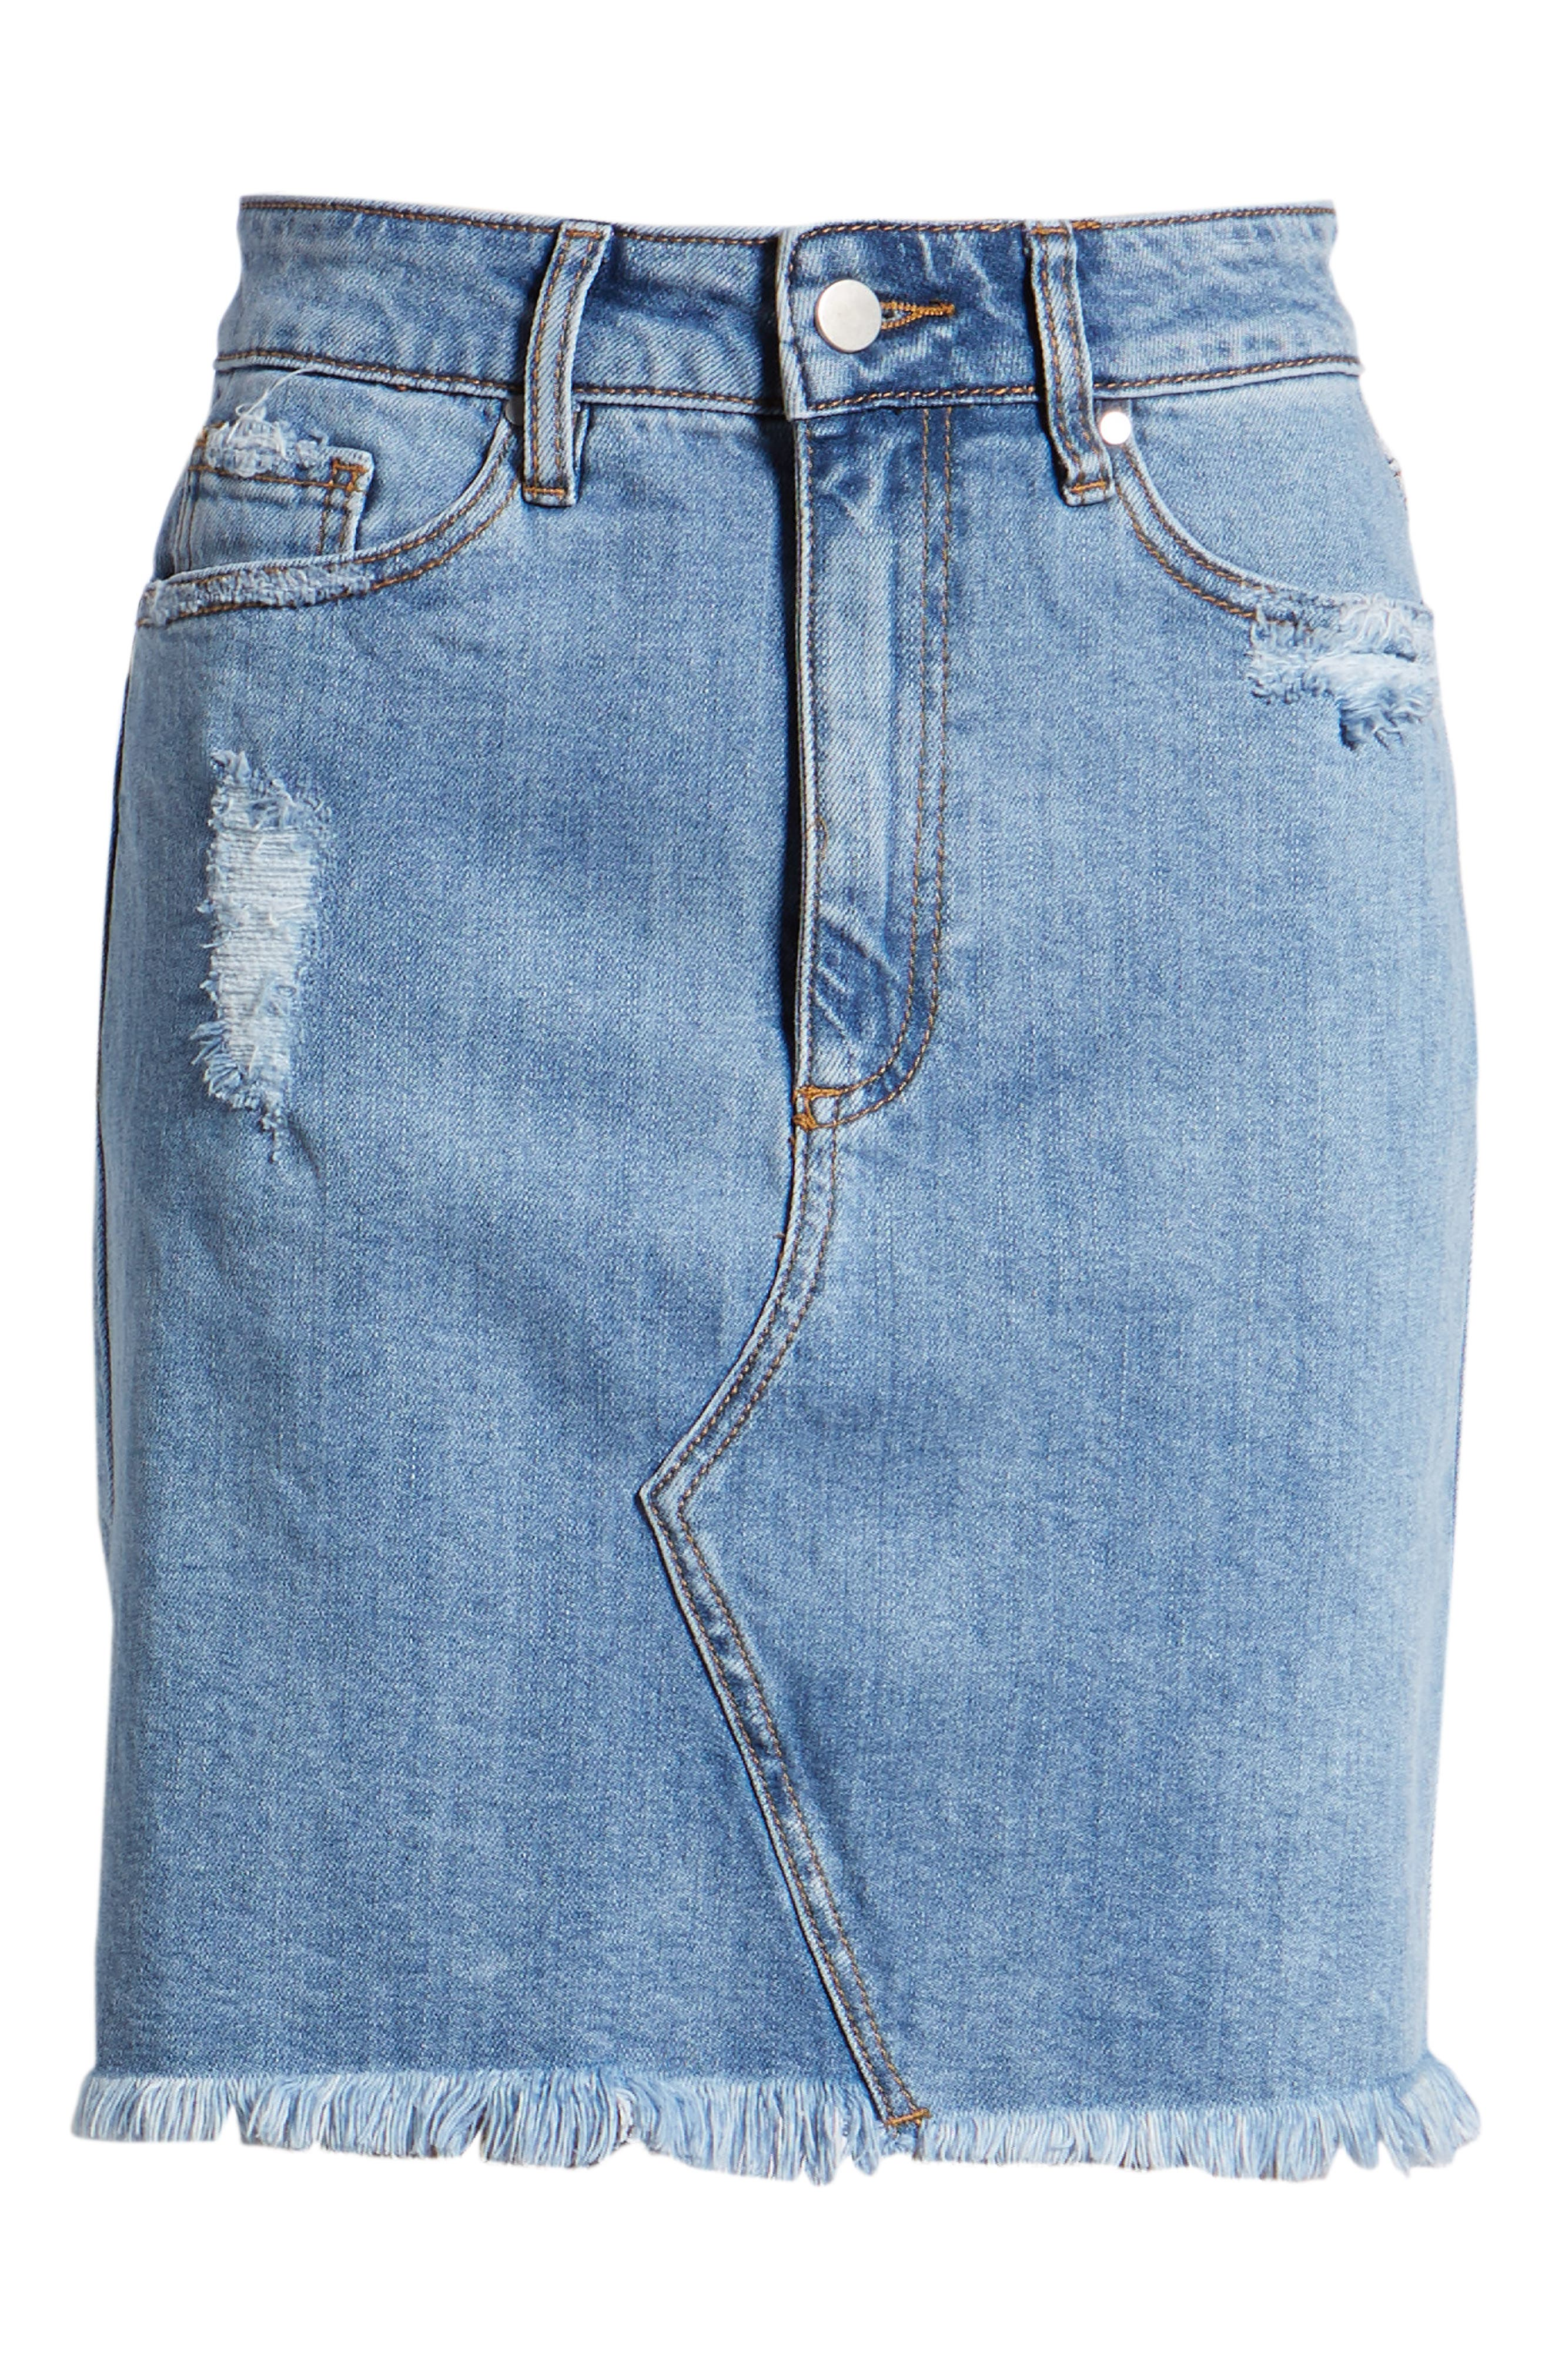 Distressed Denim Skirt,                             Alternate thumbnail 7, color,                             400